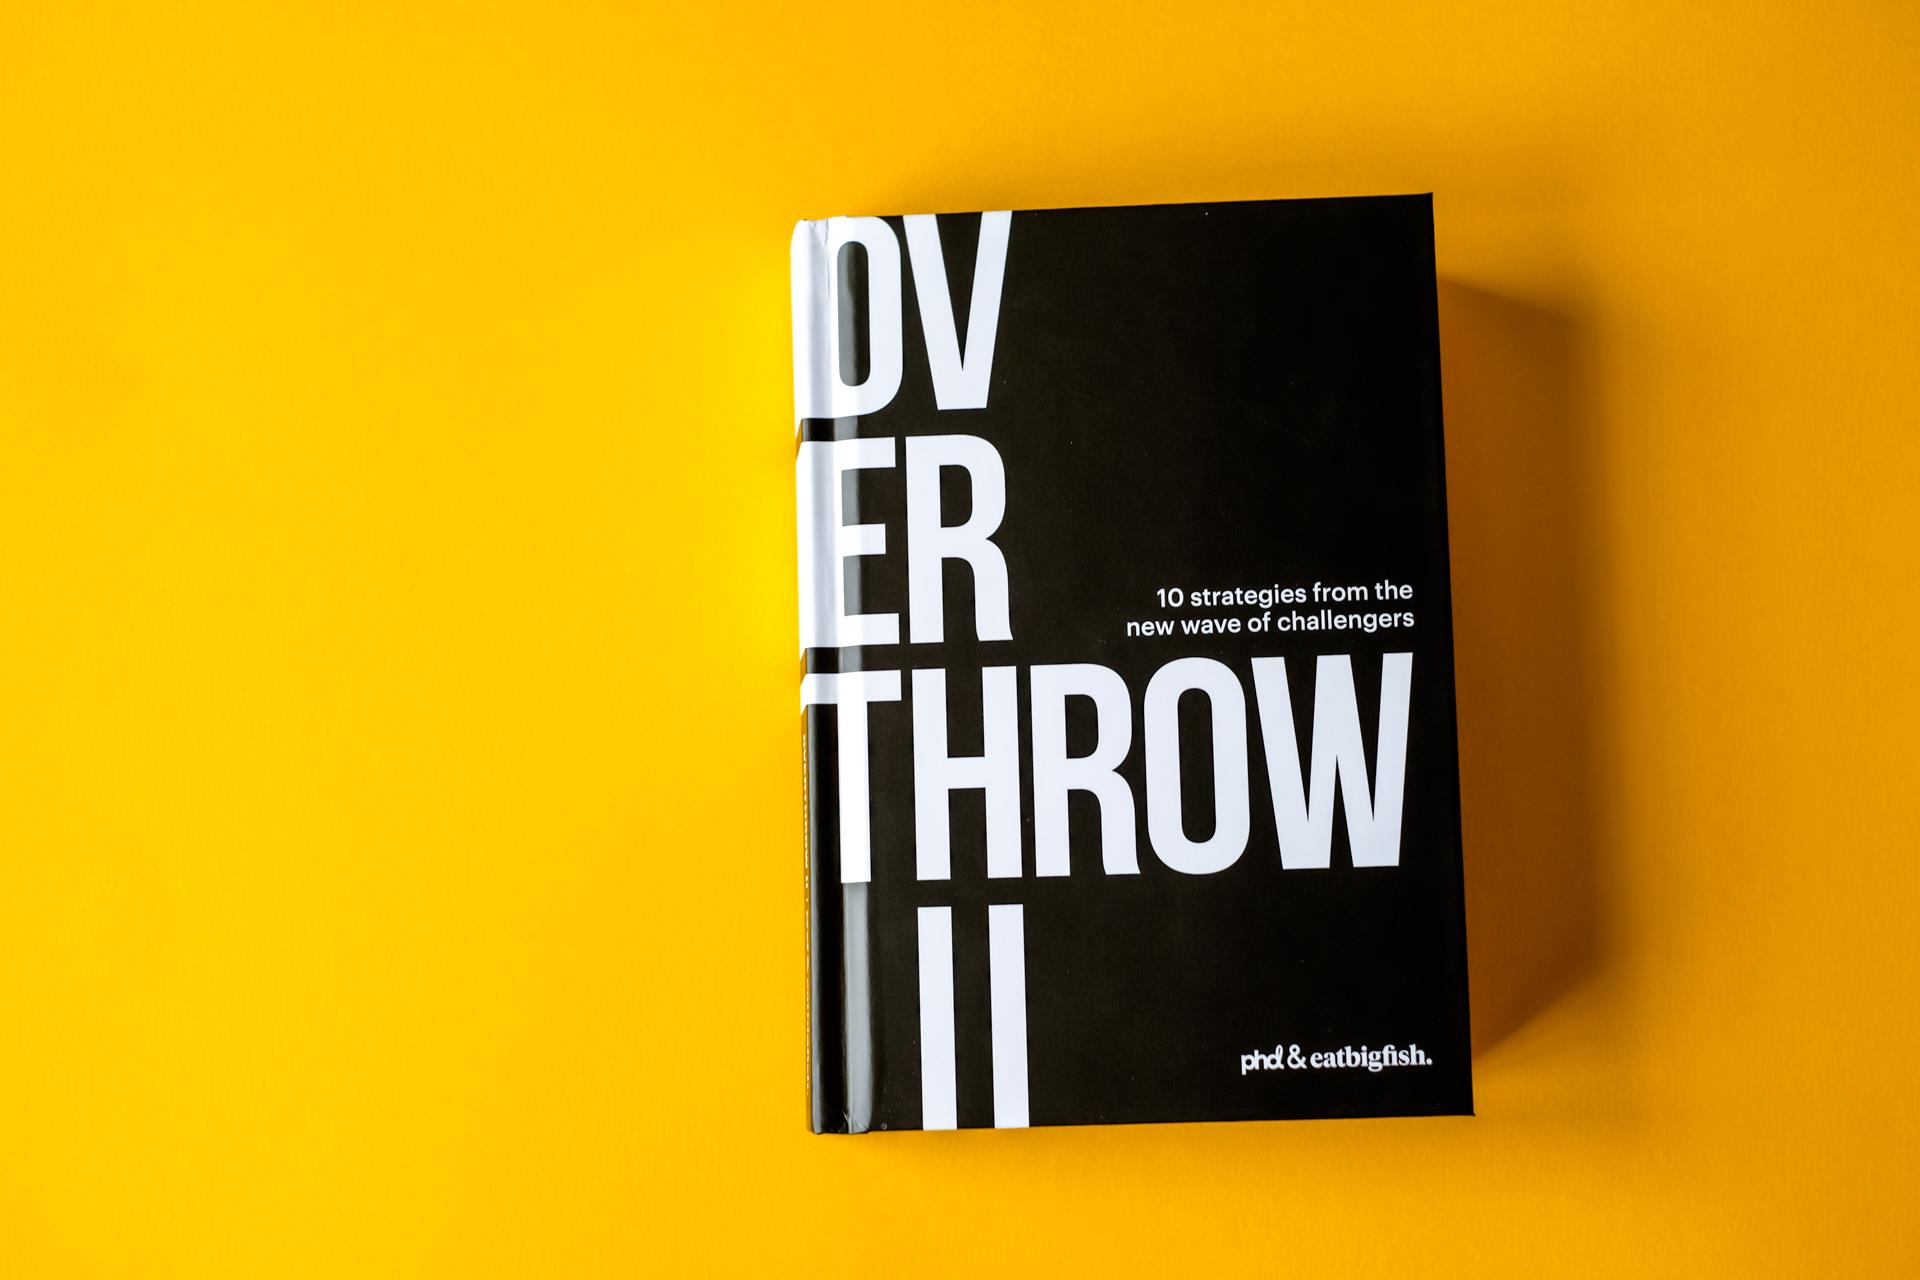 Overthrow-strategies-yellow-1920.jpg